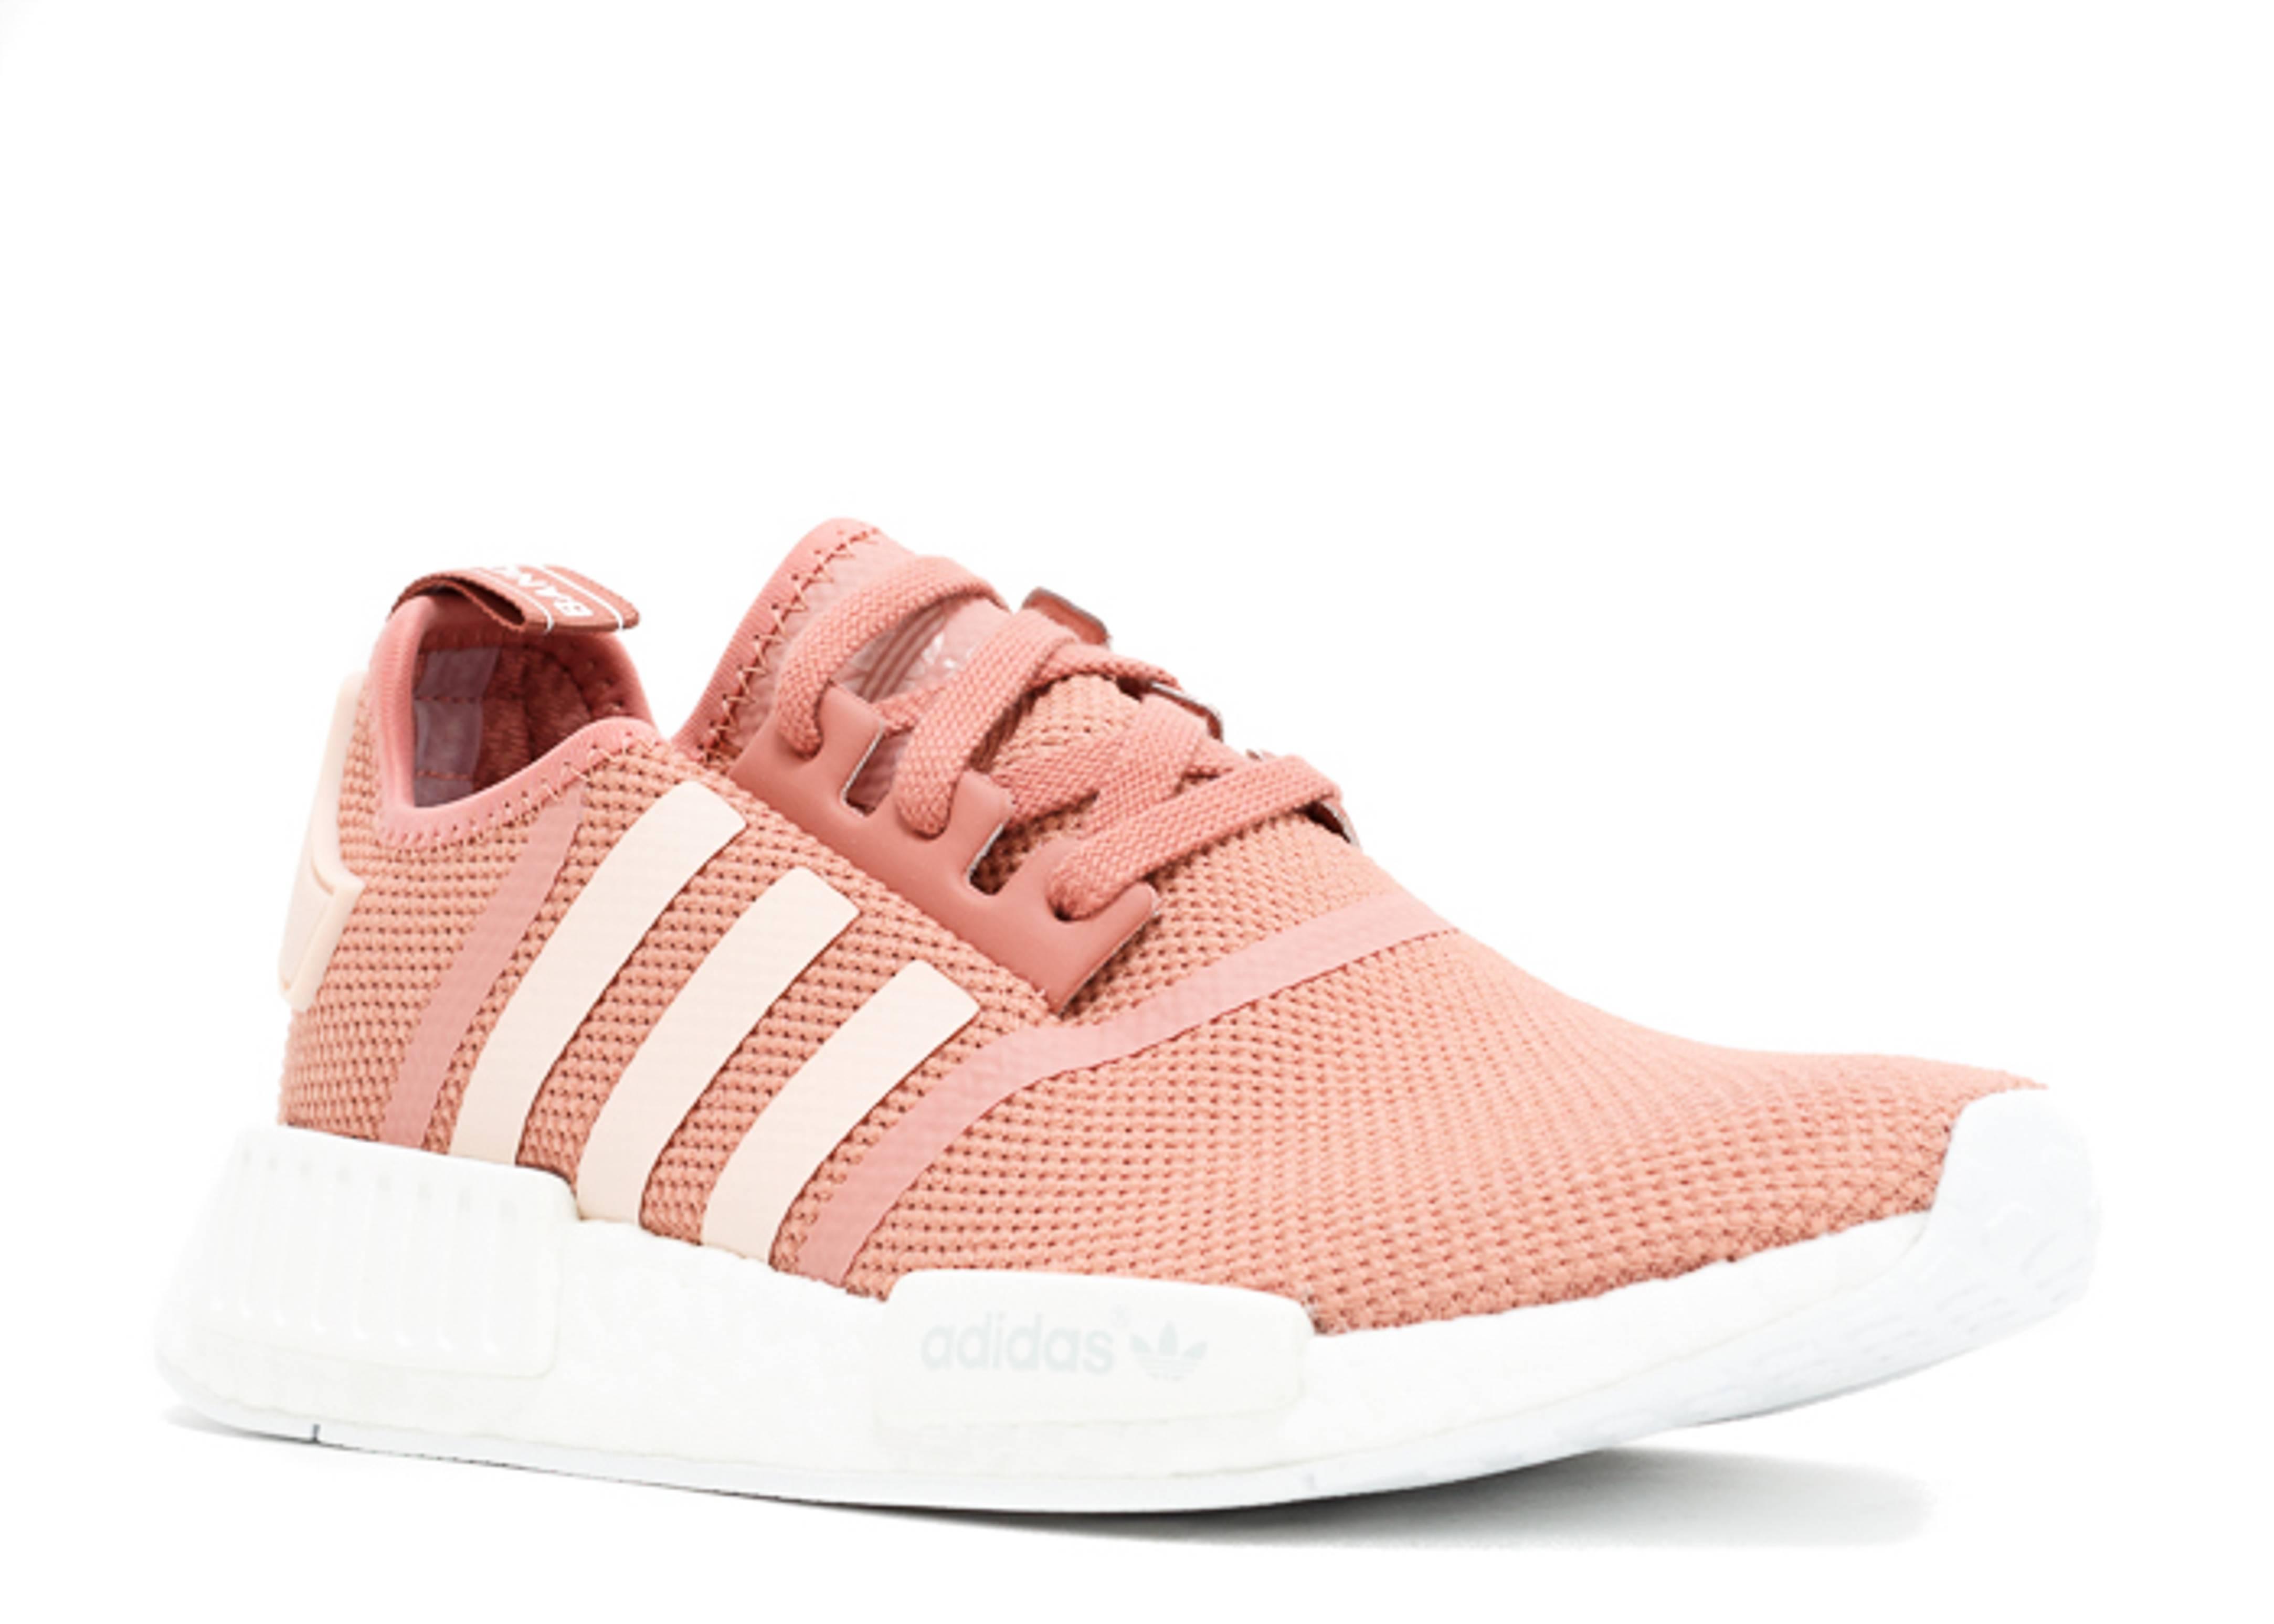 adidas shoes nmd pink. adidas shoes nmd pink